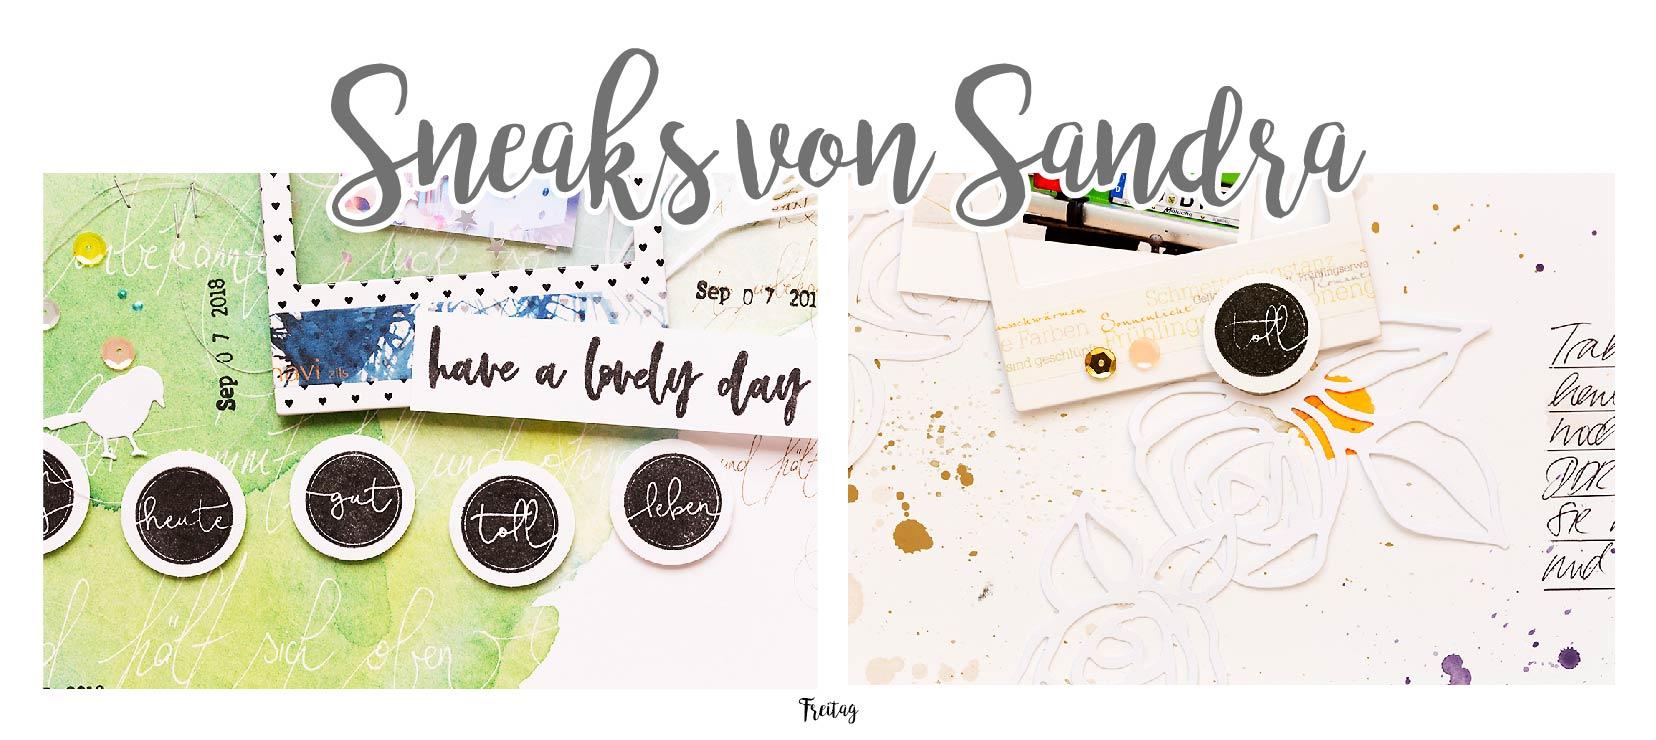 SneaksBlog_Sandra